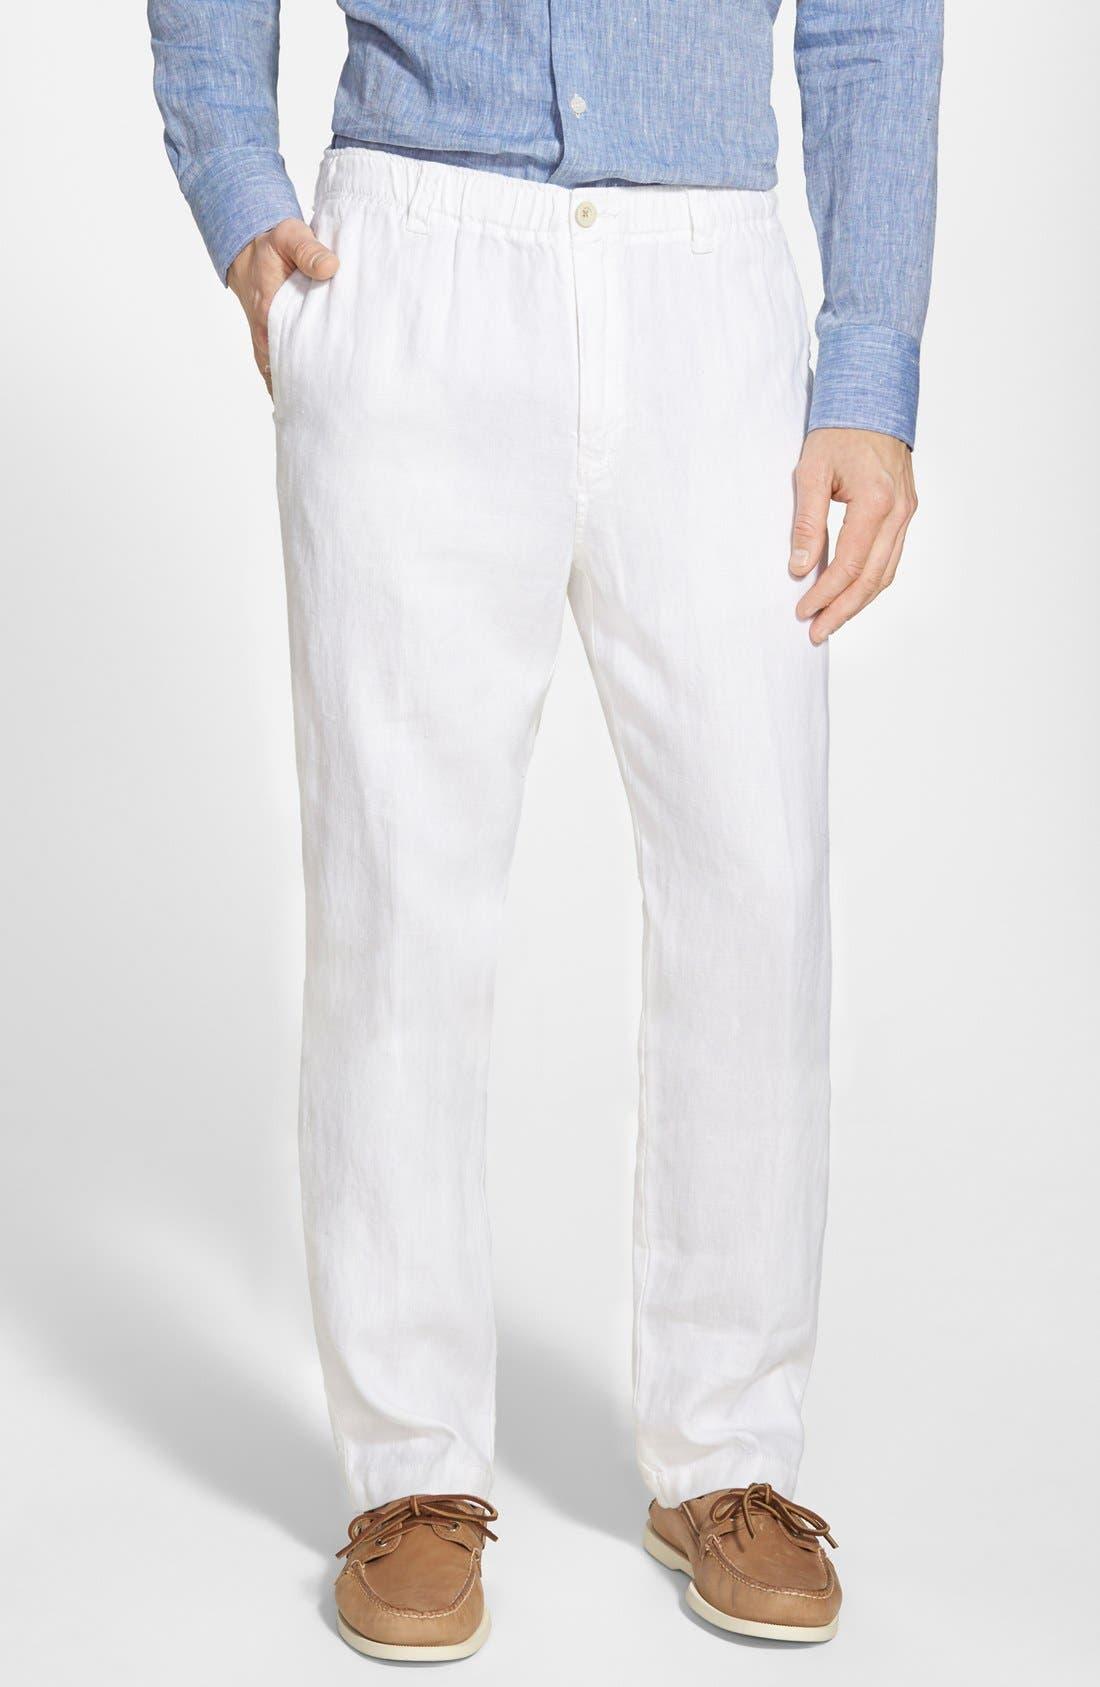 New Linen on the Beach Linen Pants,                             Main thumbnail 1, color,                             White